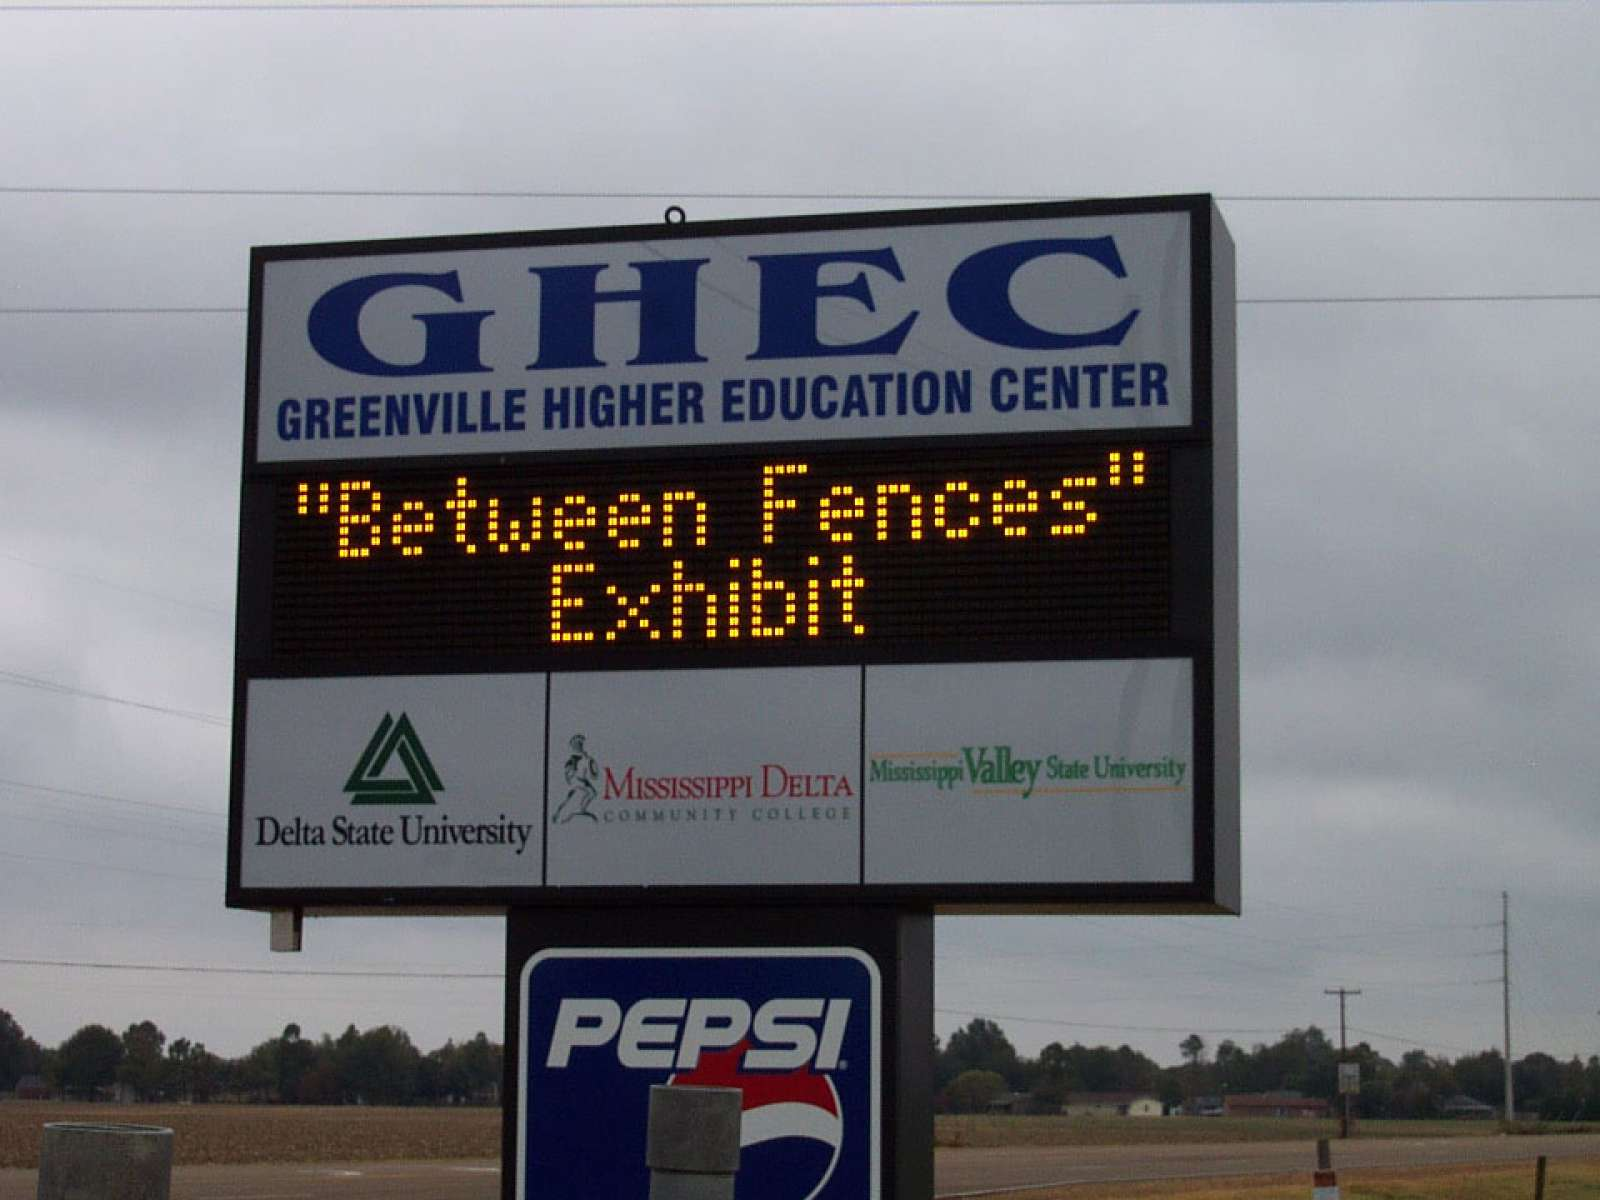 Between Fences Greenville, Mississippi 2005